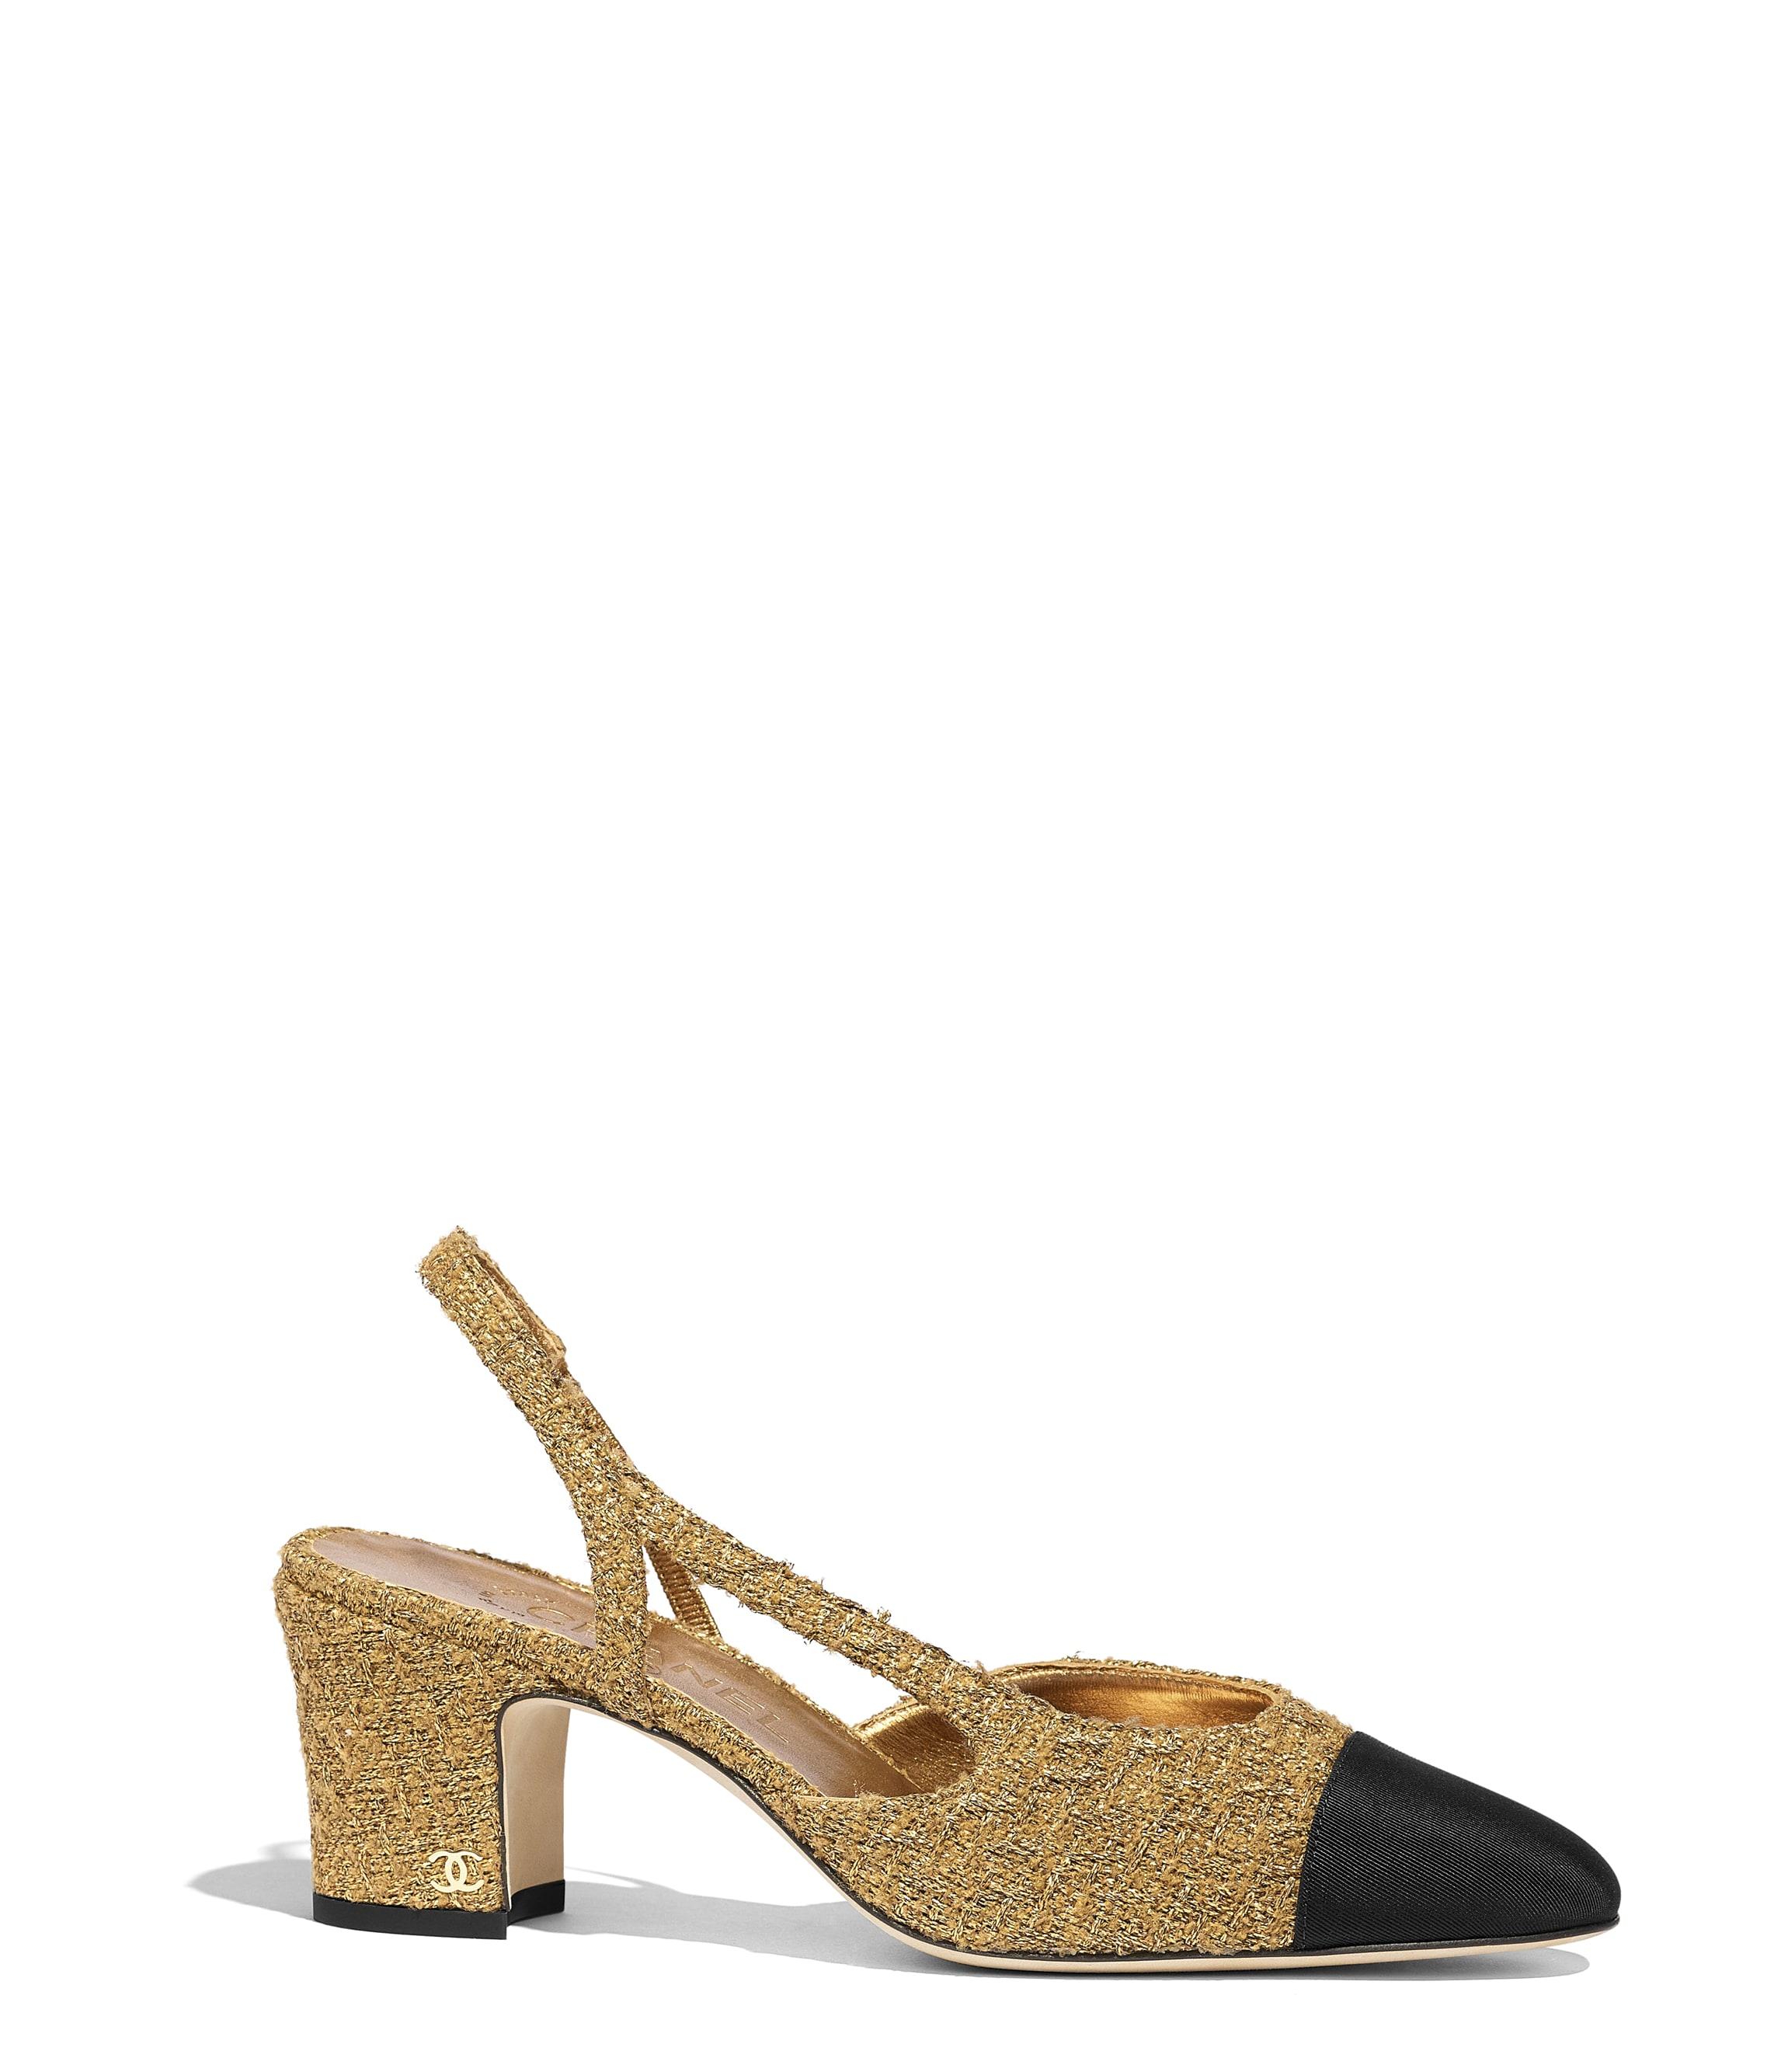 cfe7f35ff62 Pumps & Slingbacks - Shoes - CHANEL